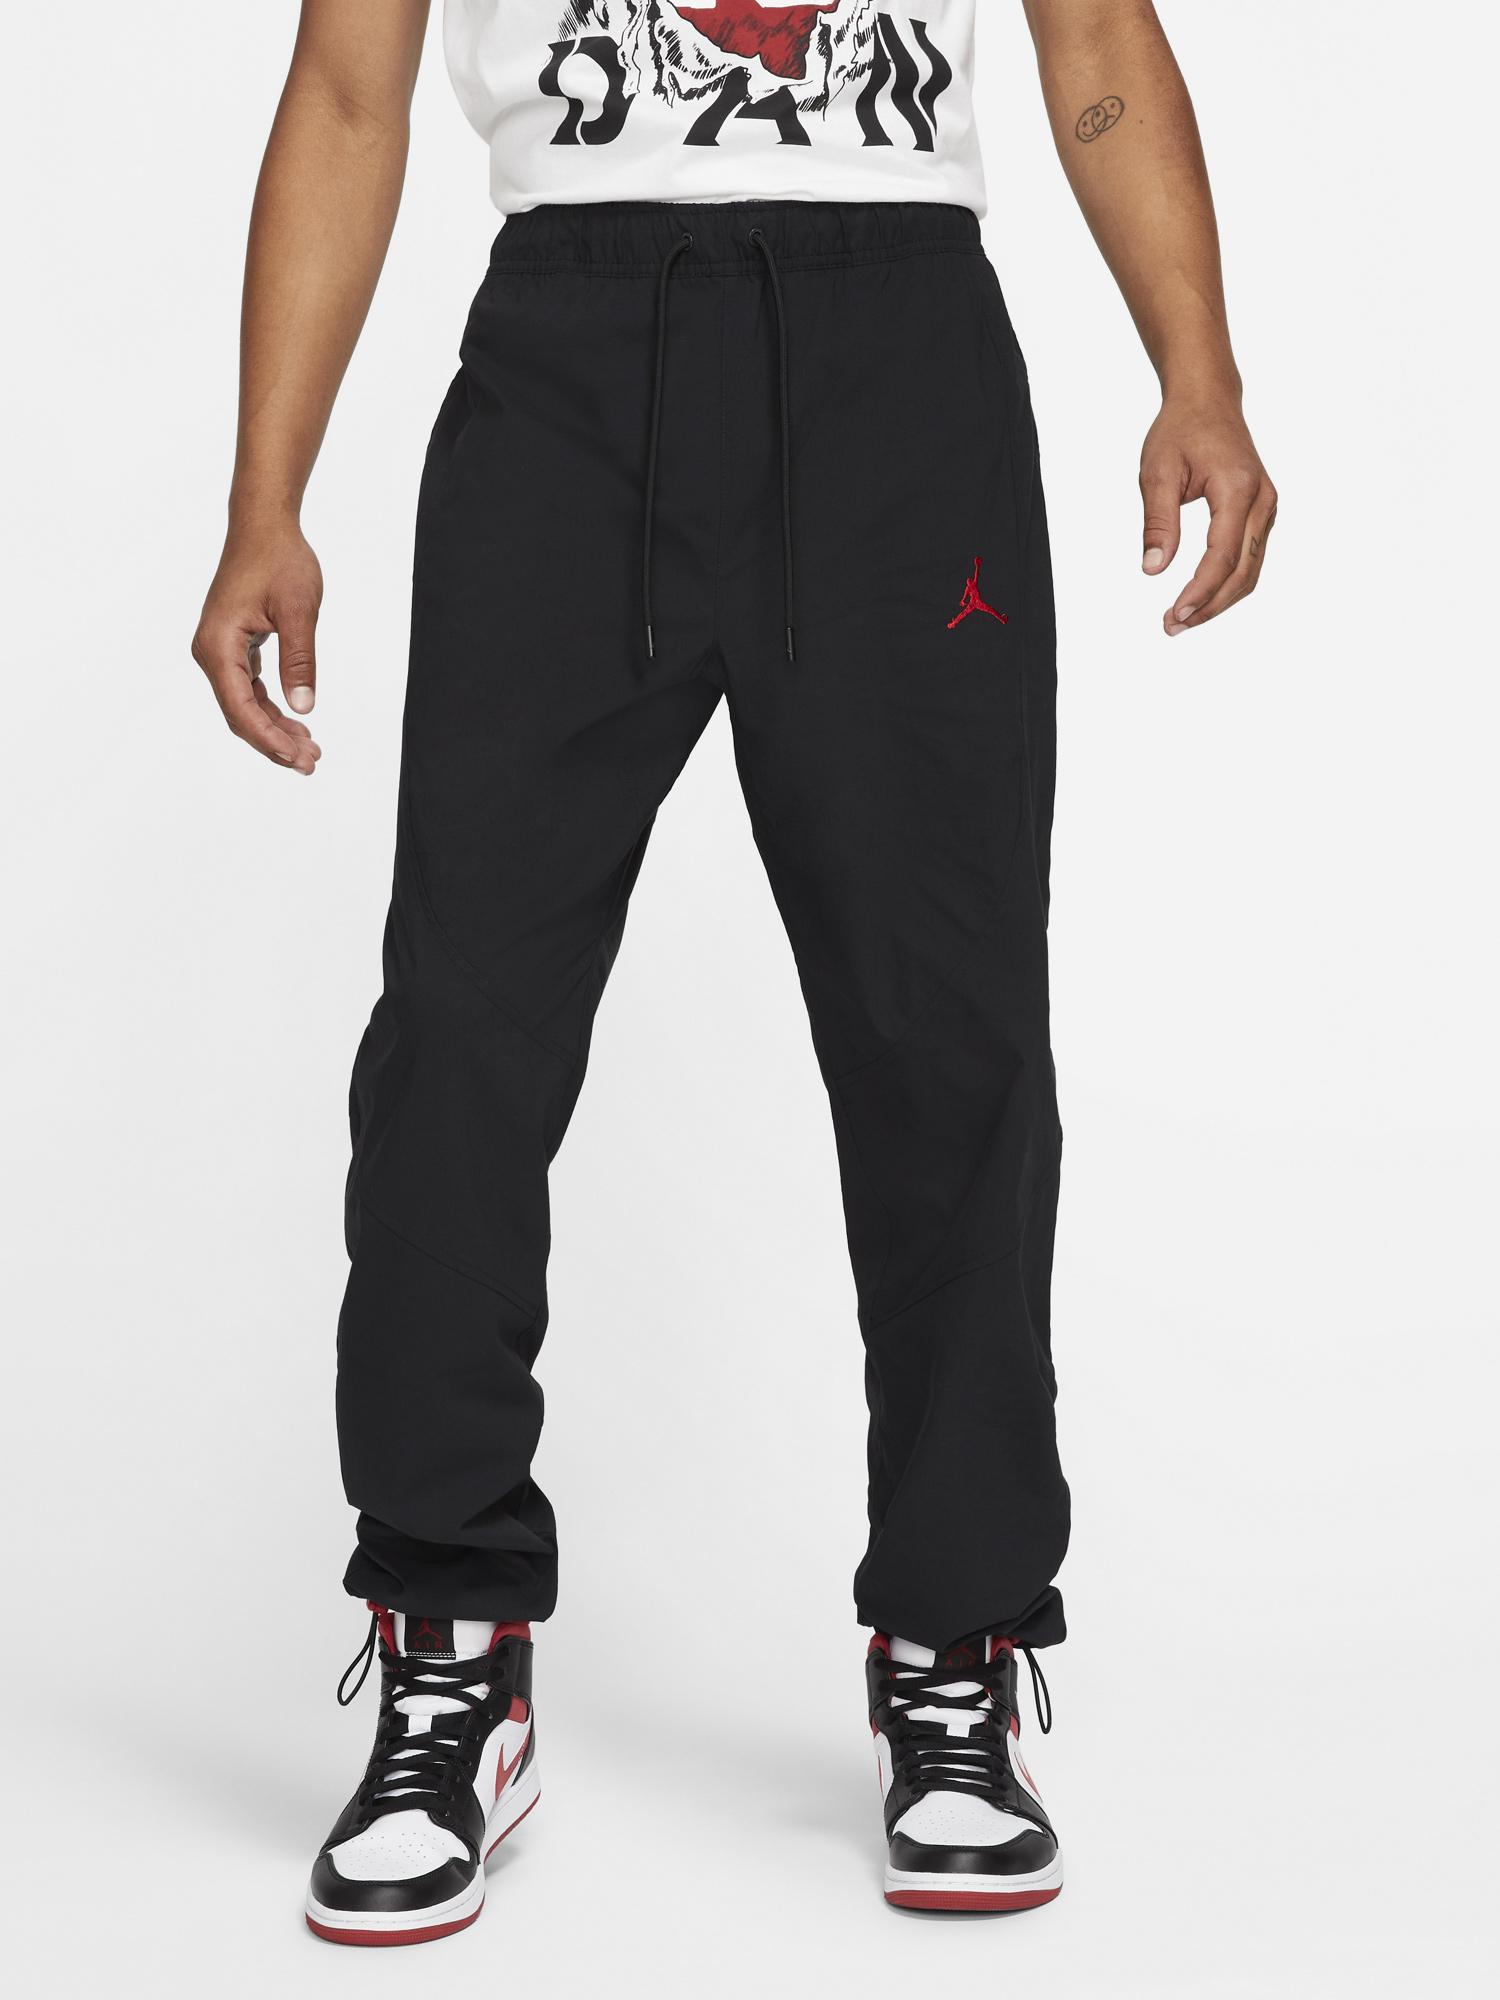 jordan-essential-woven-pants-black-red-1